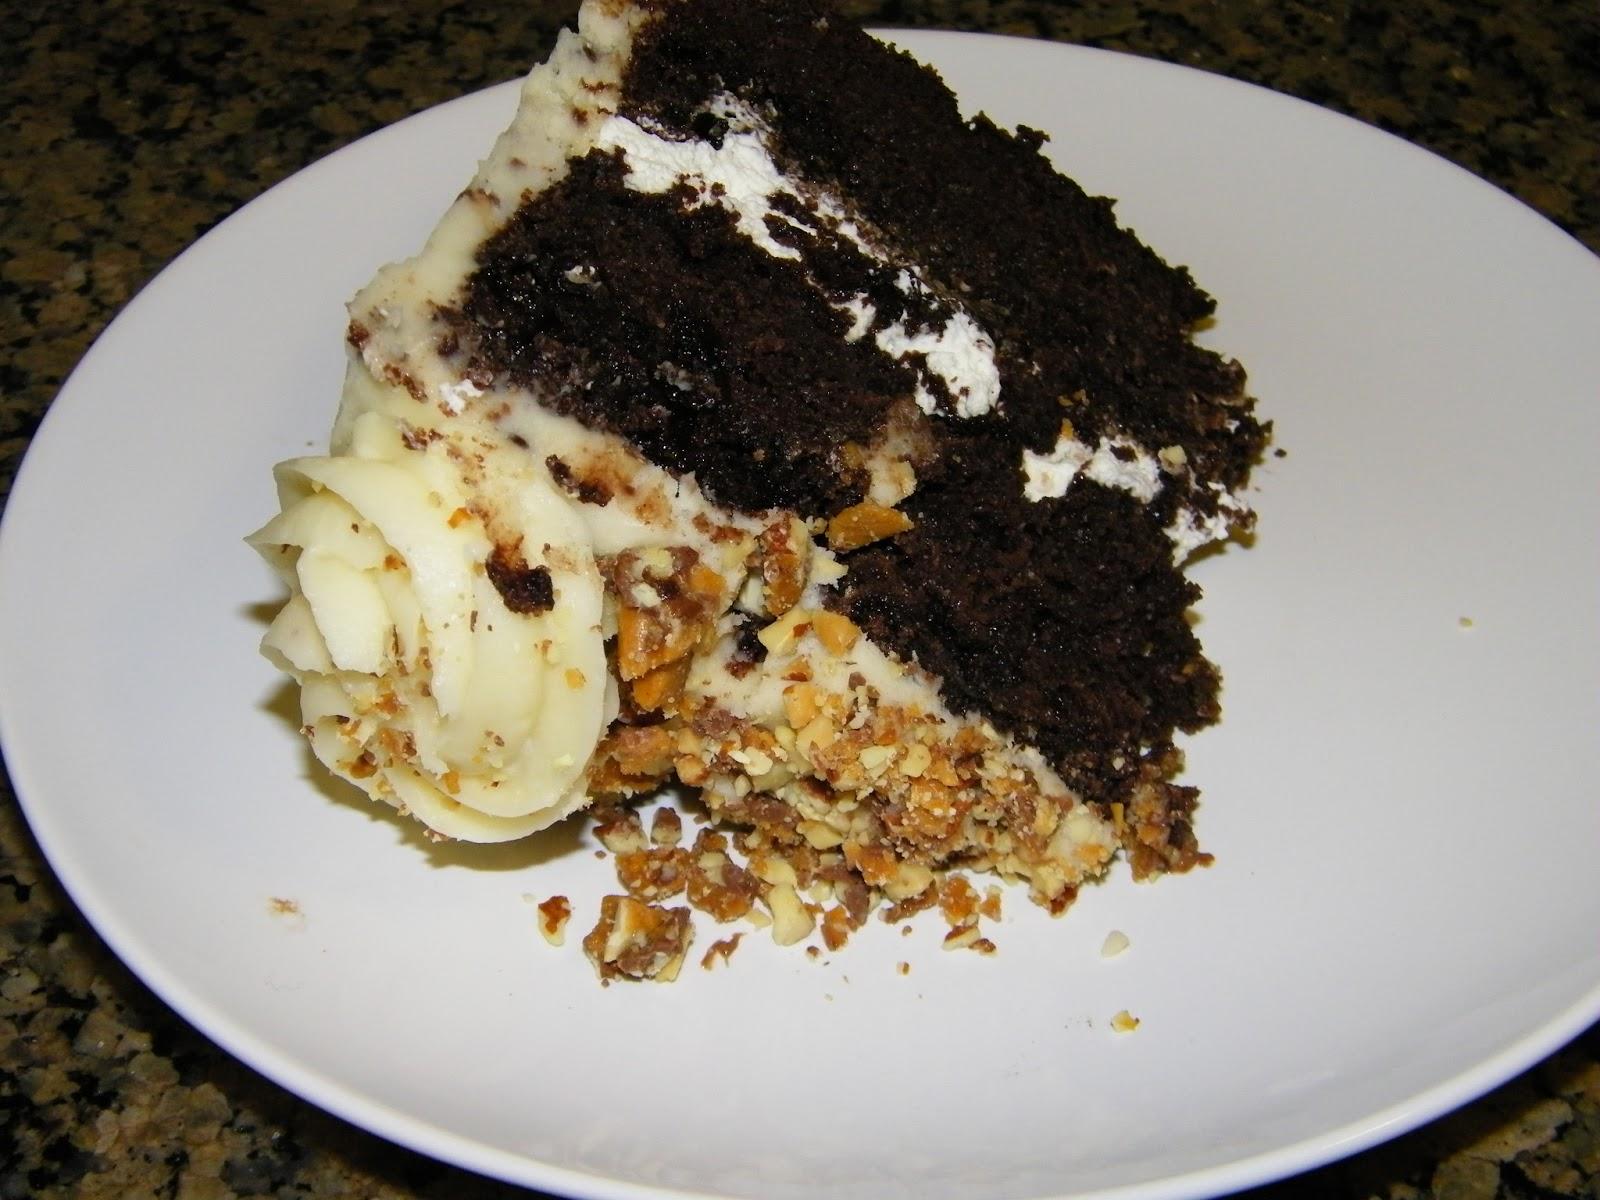 Cake Boss Buttercream Icing Recipe : Cake Recipe: Cake Boss Vanilla Frosting Recipe